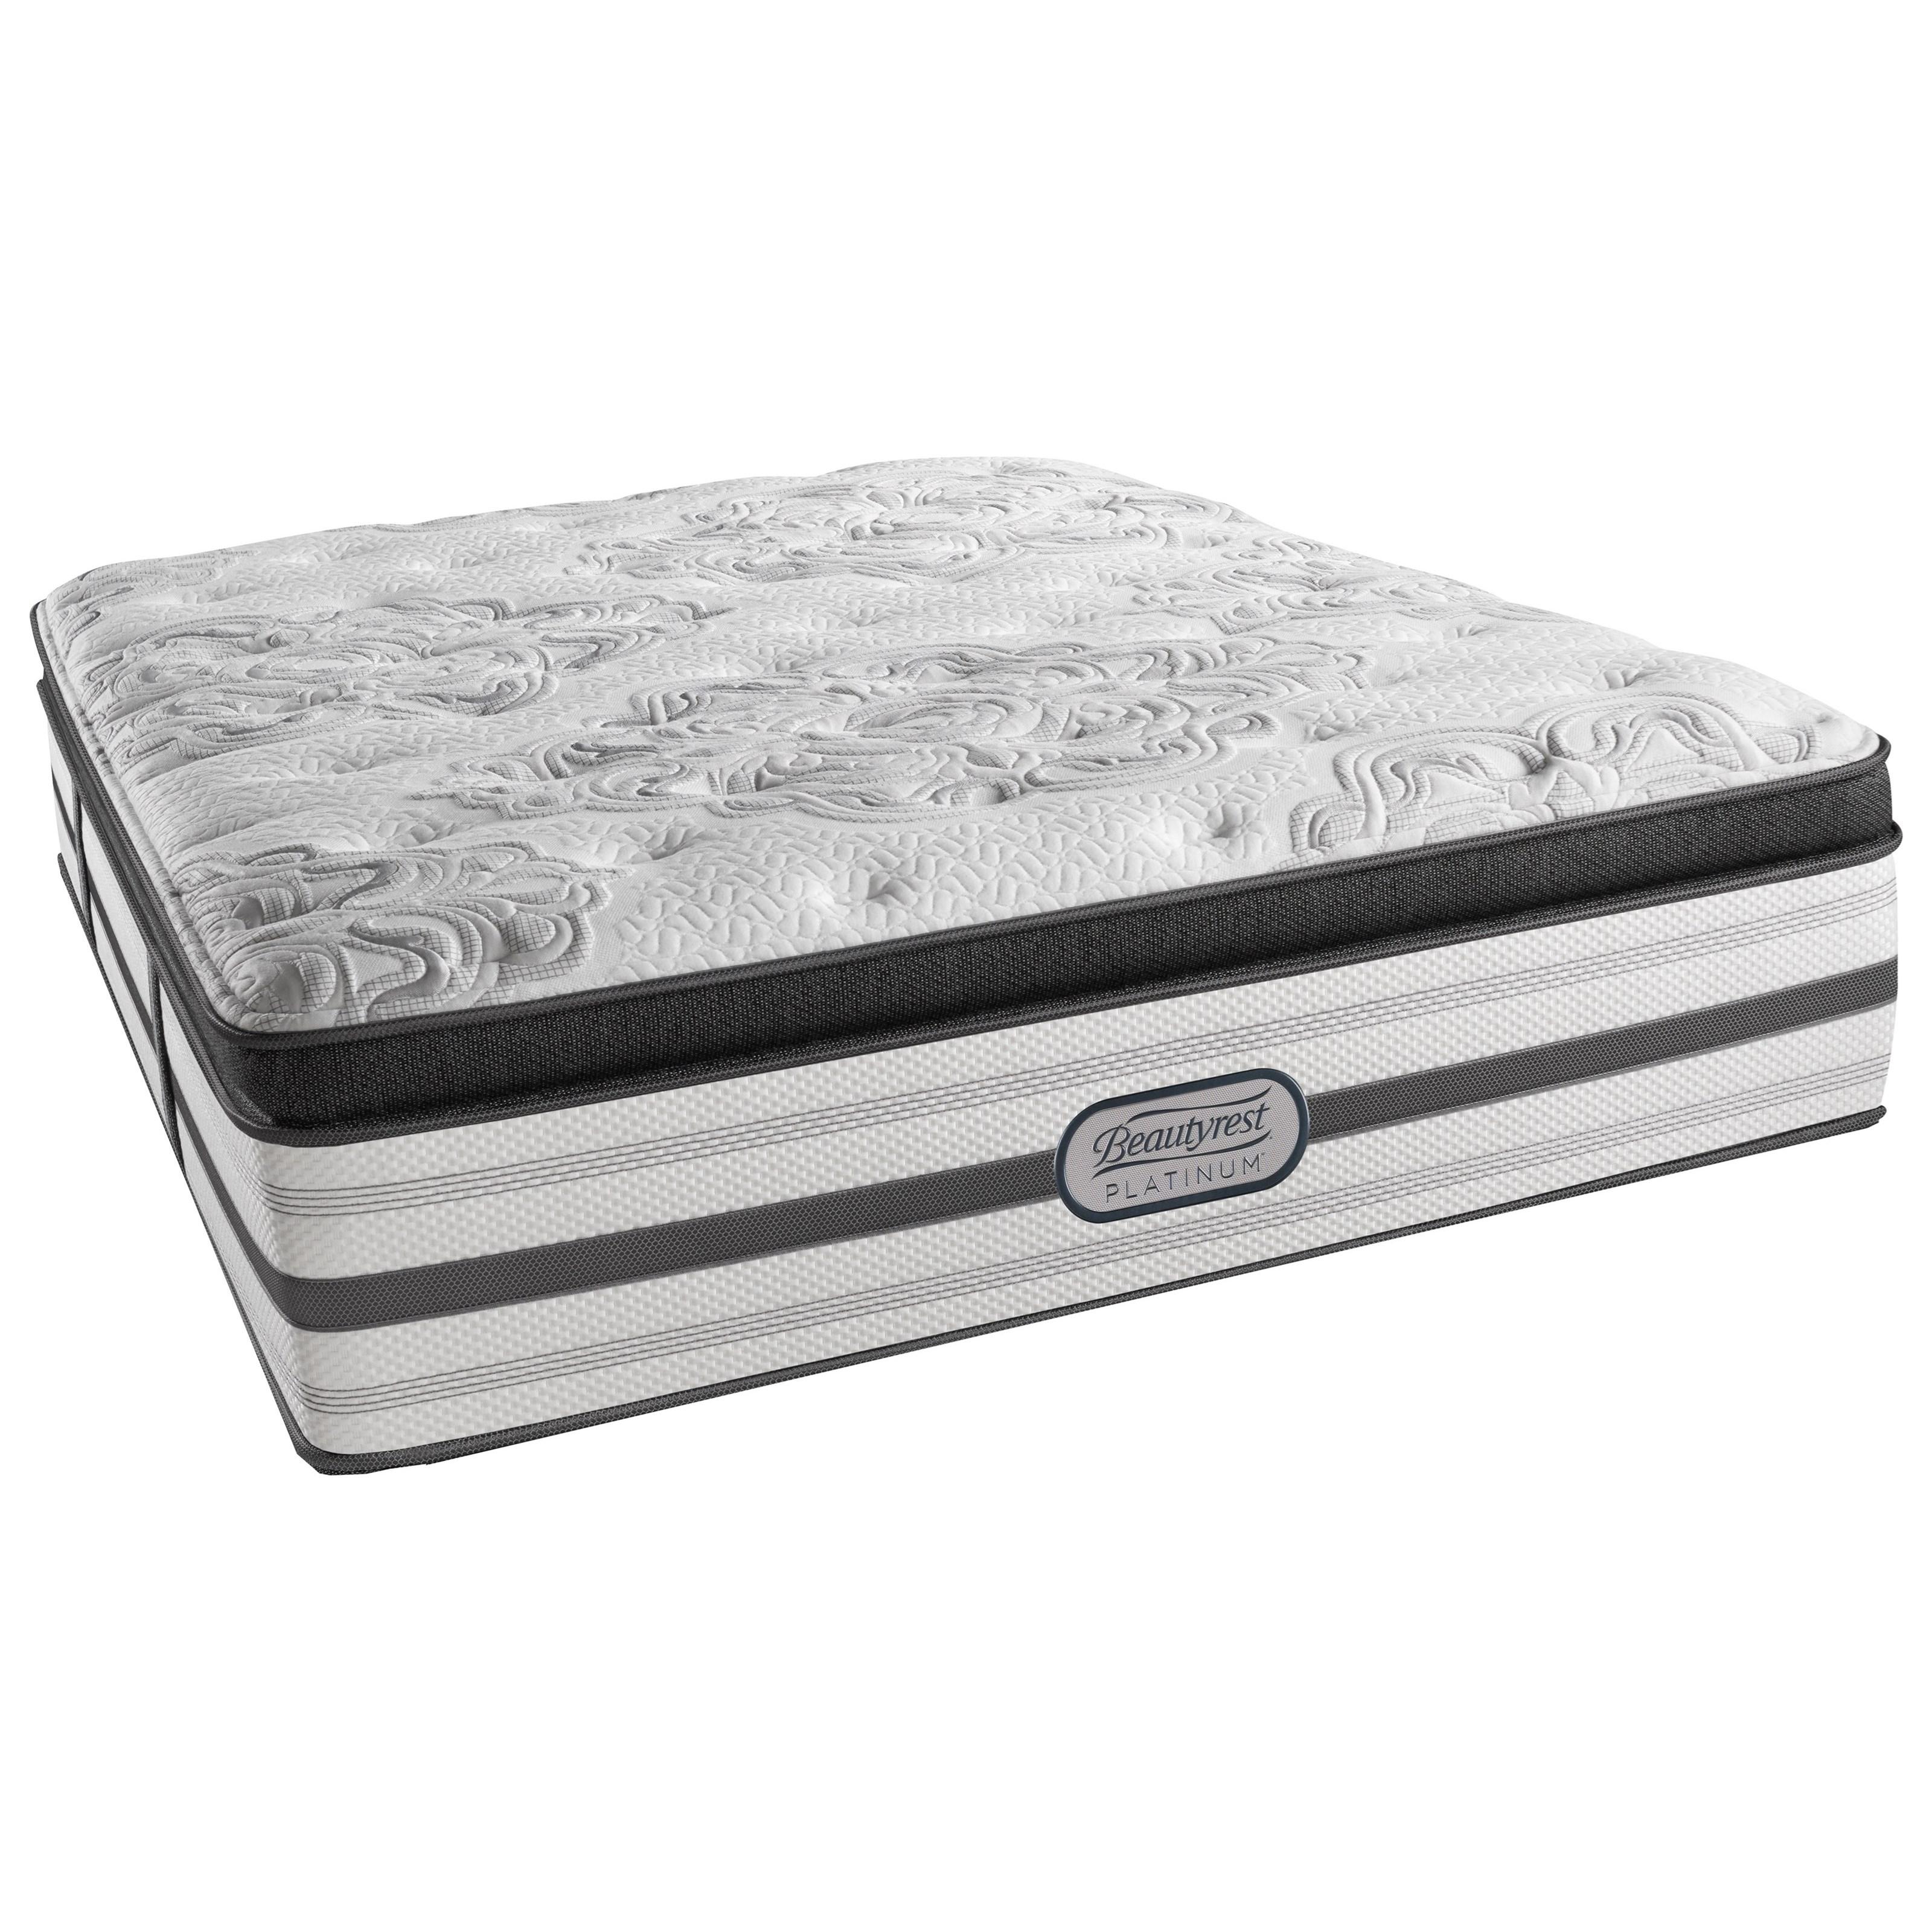 Beautyrest Platinum Katherine Cal King Plush Box Top Adjustable Set - Item Number: LV4PLBT-CK+2xSM1-SPCK